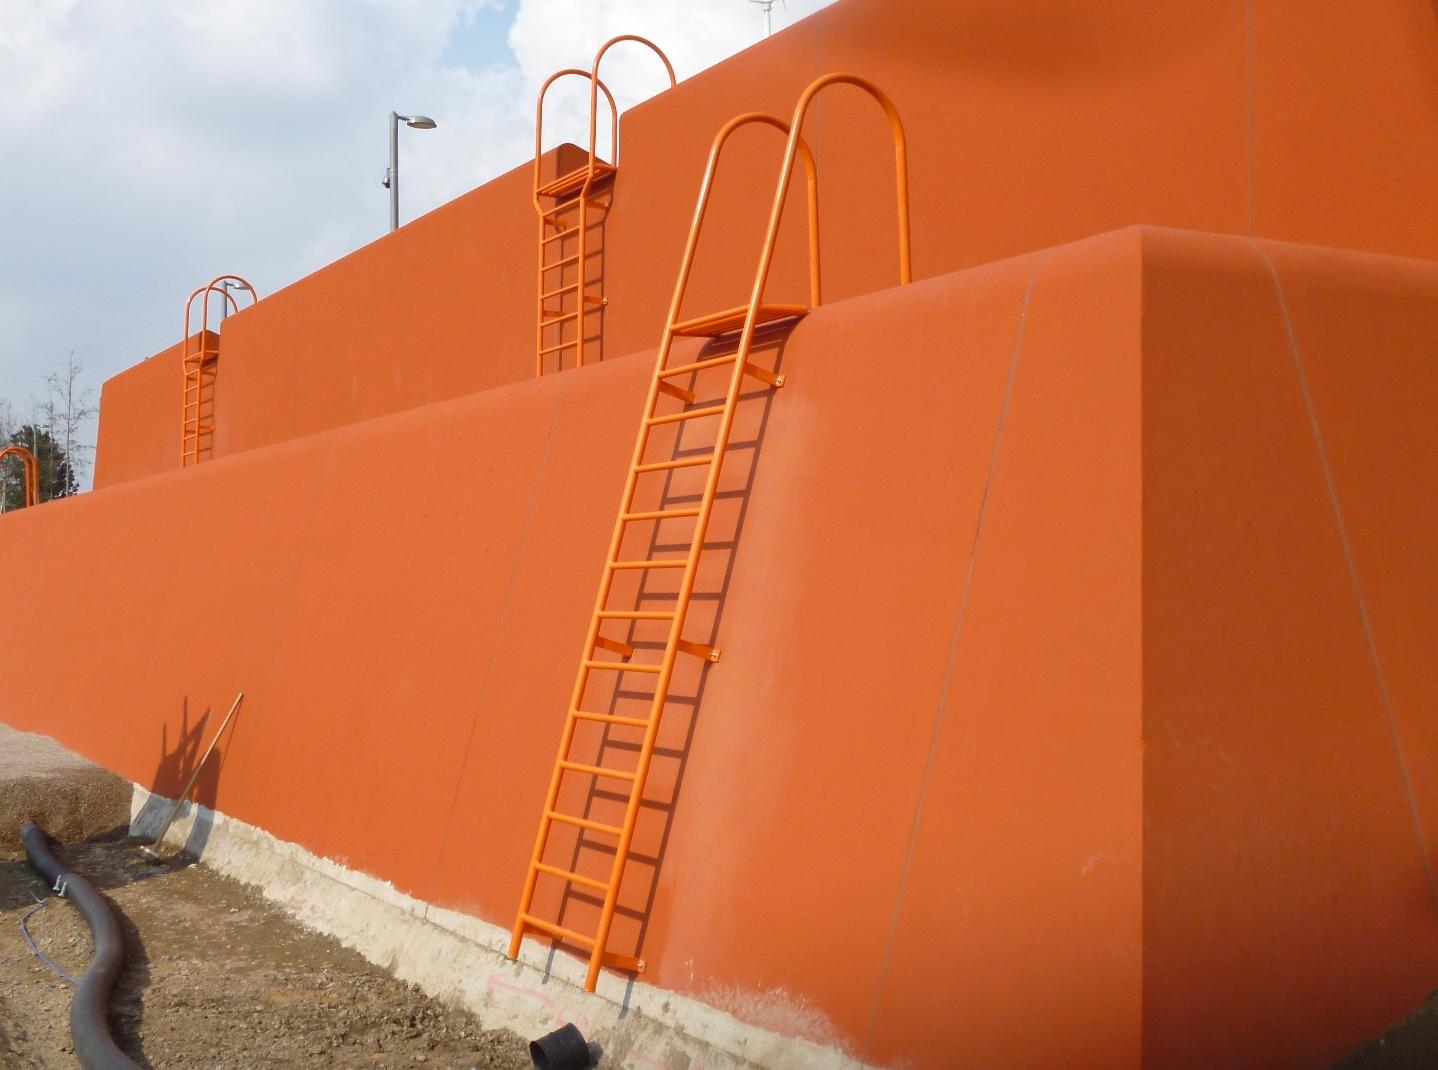 Climbing wall ladders